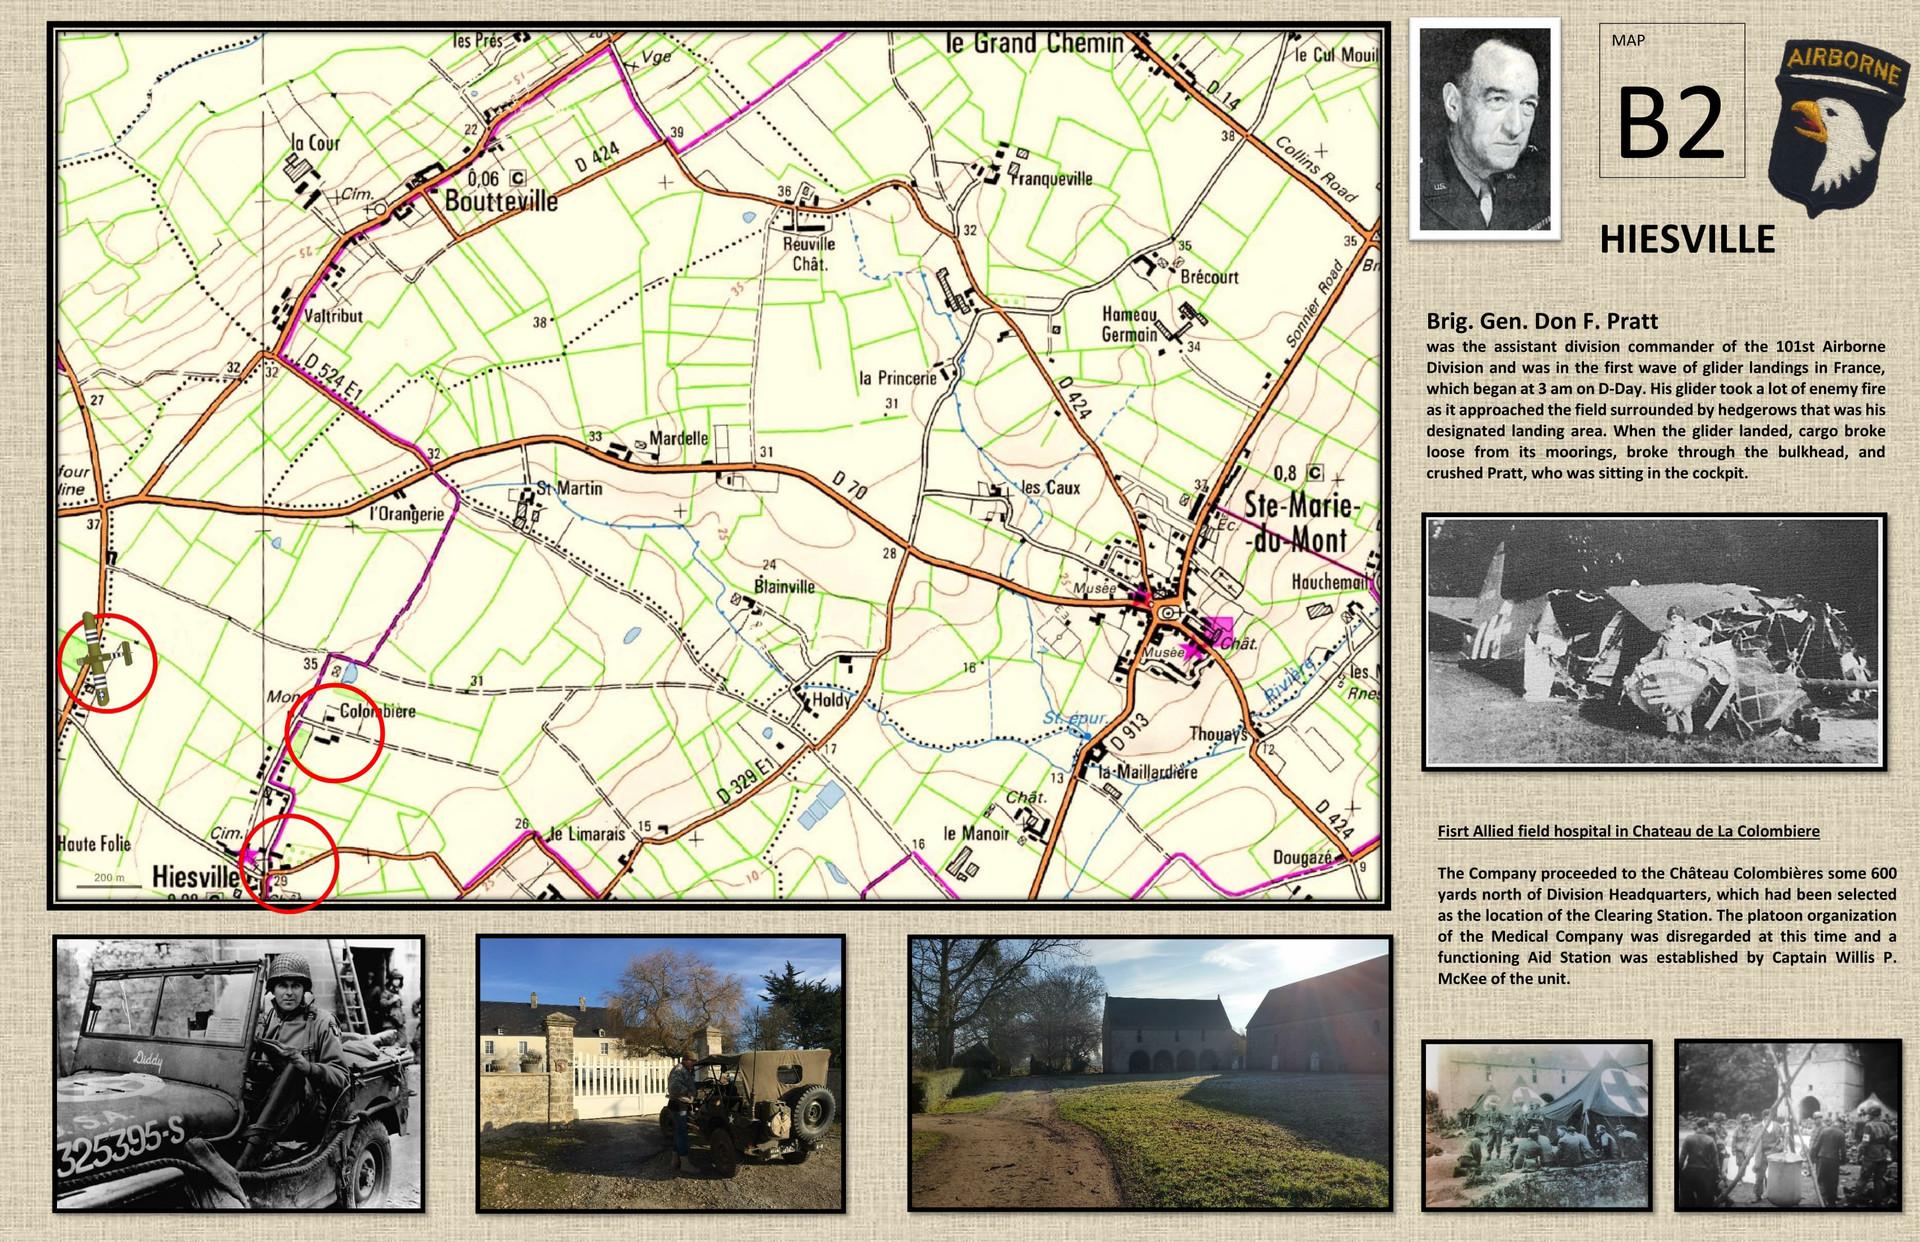 map B2 hiesville-1.jpg